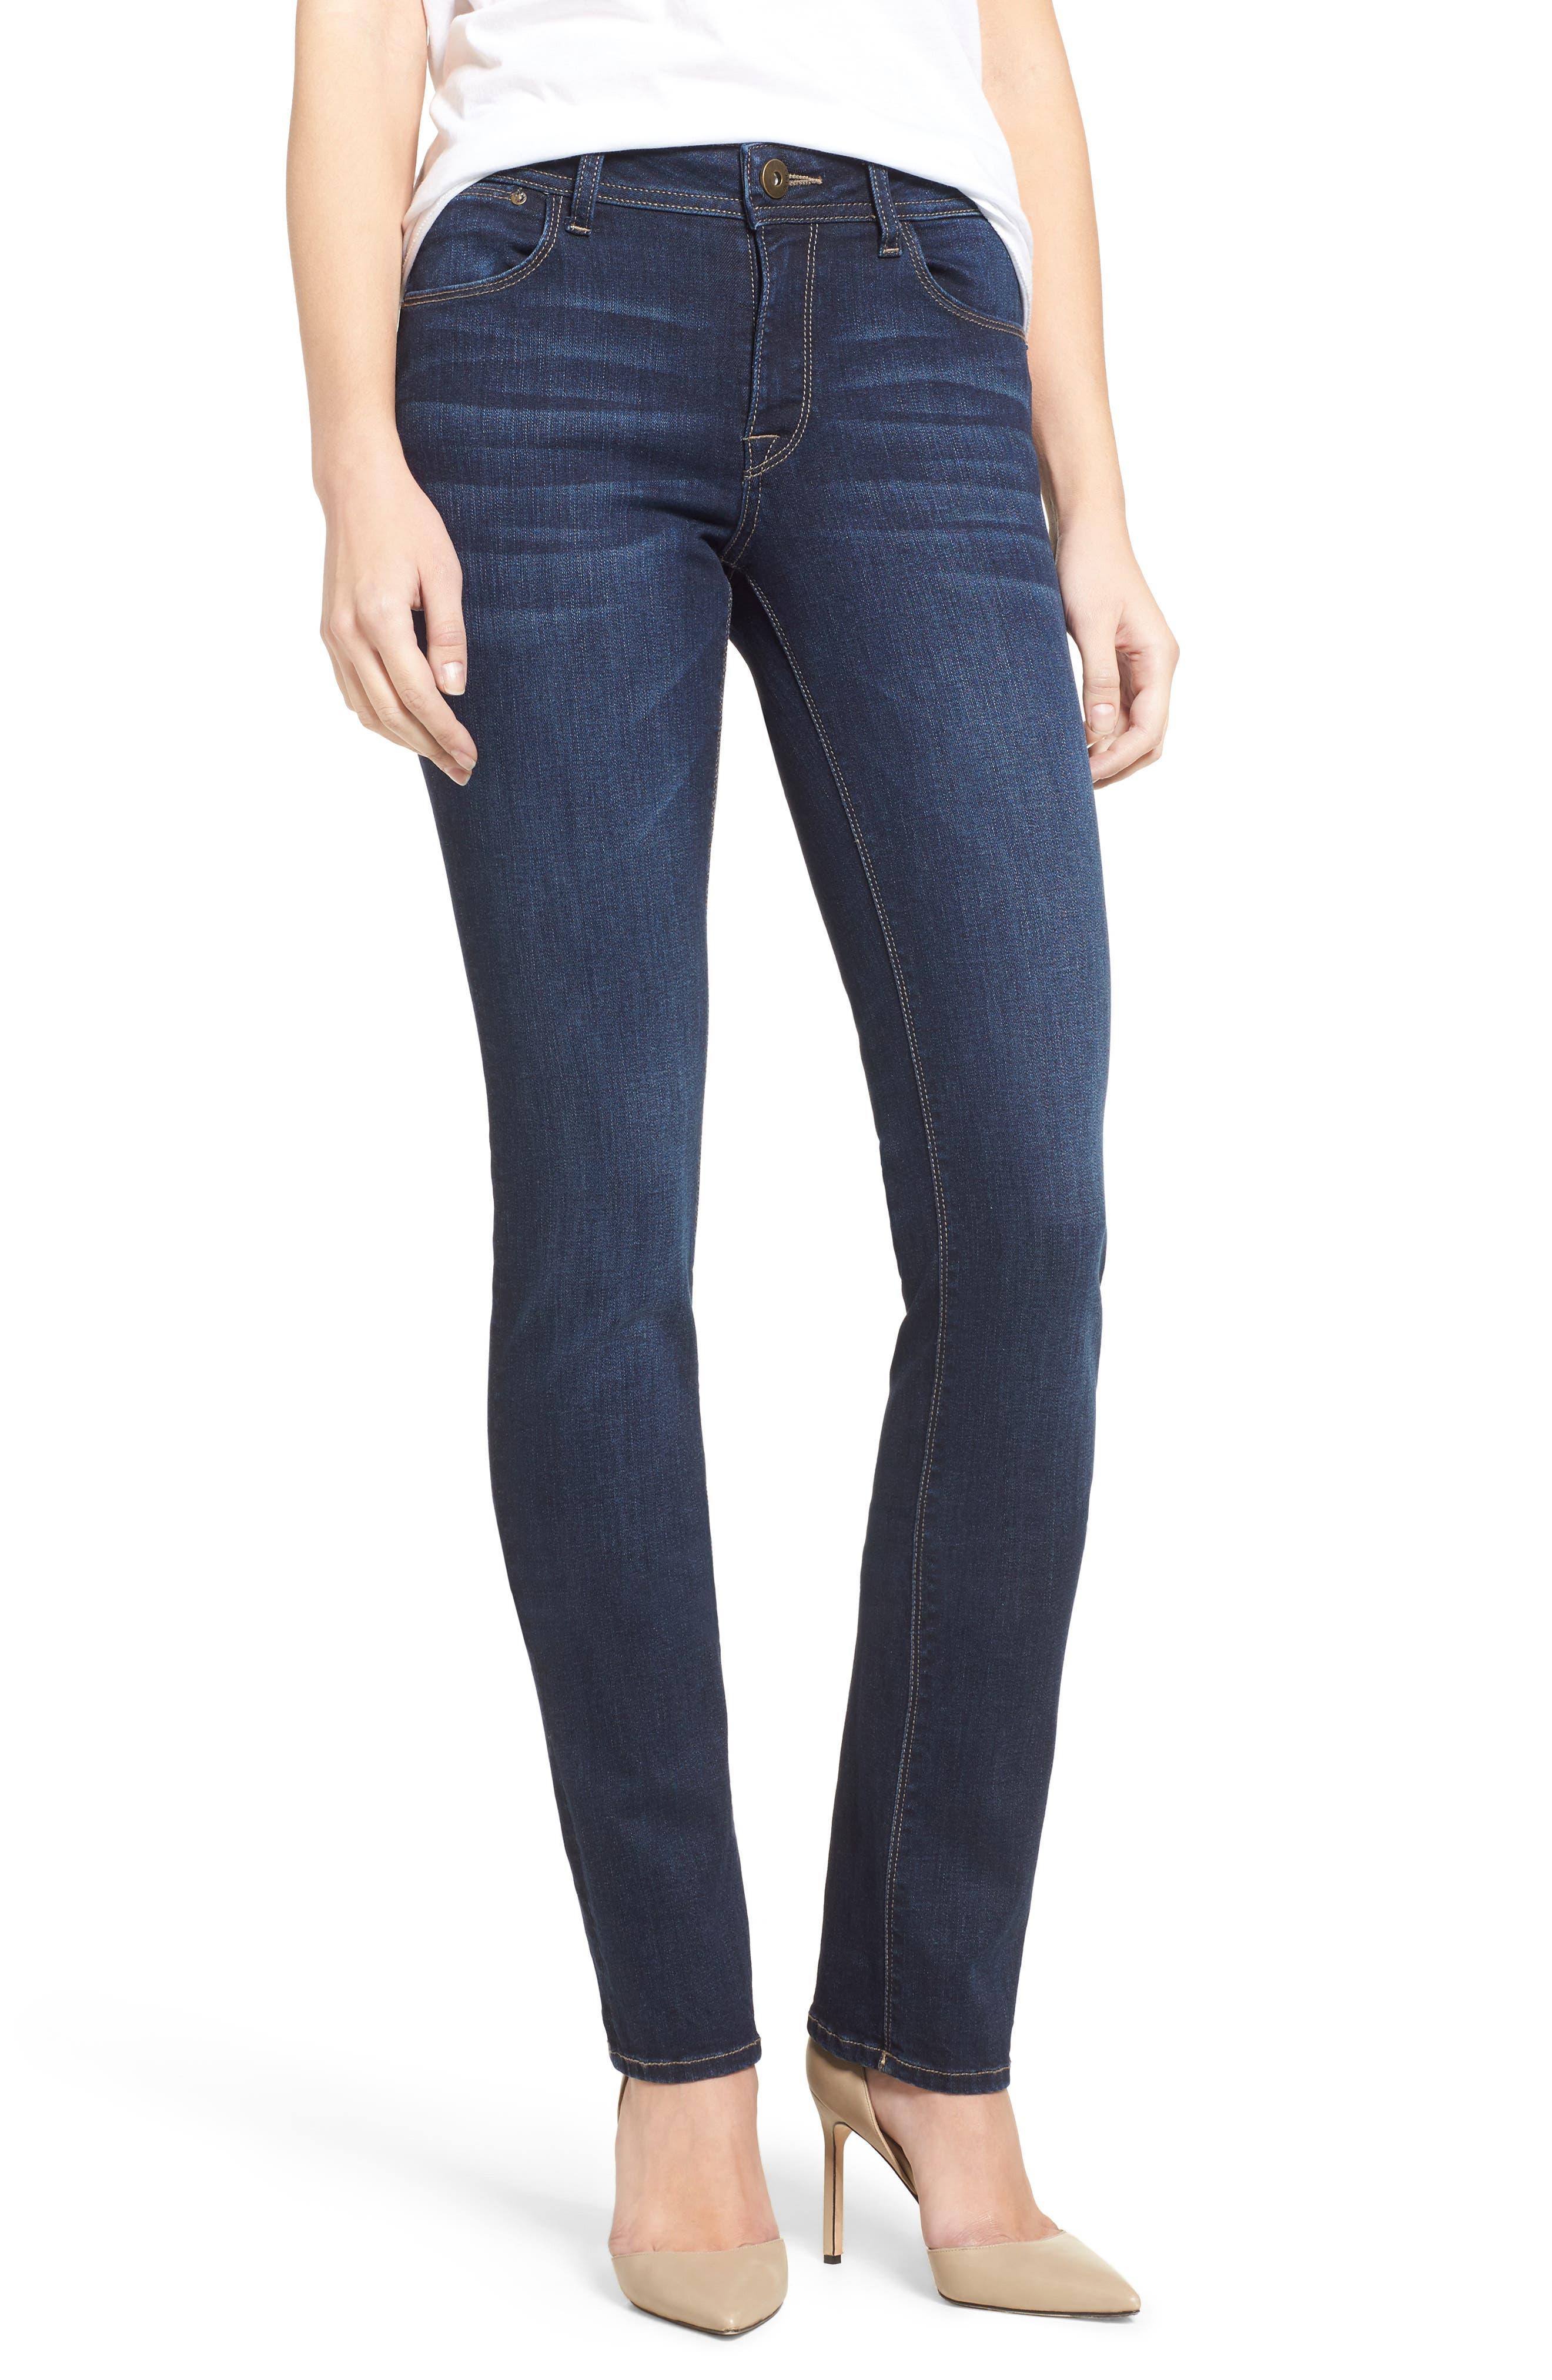 Main Image - DL1961 'Coco' Curvy Slim Straight Leg Jeans (Atlas)